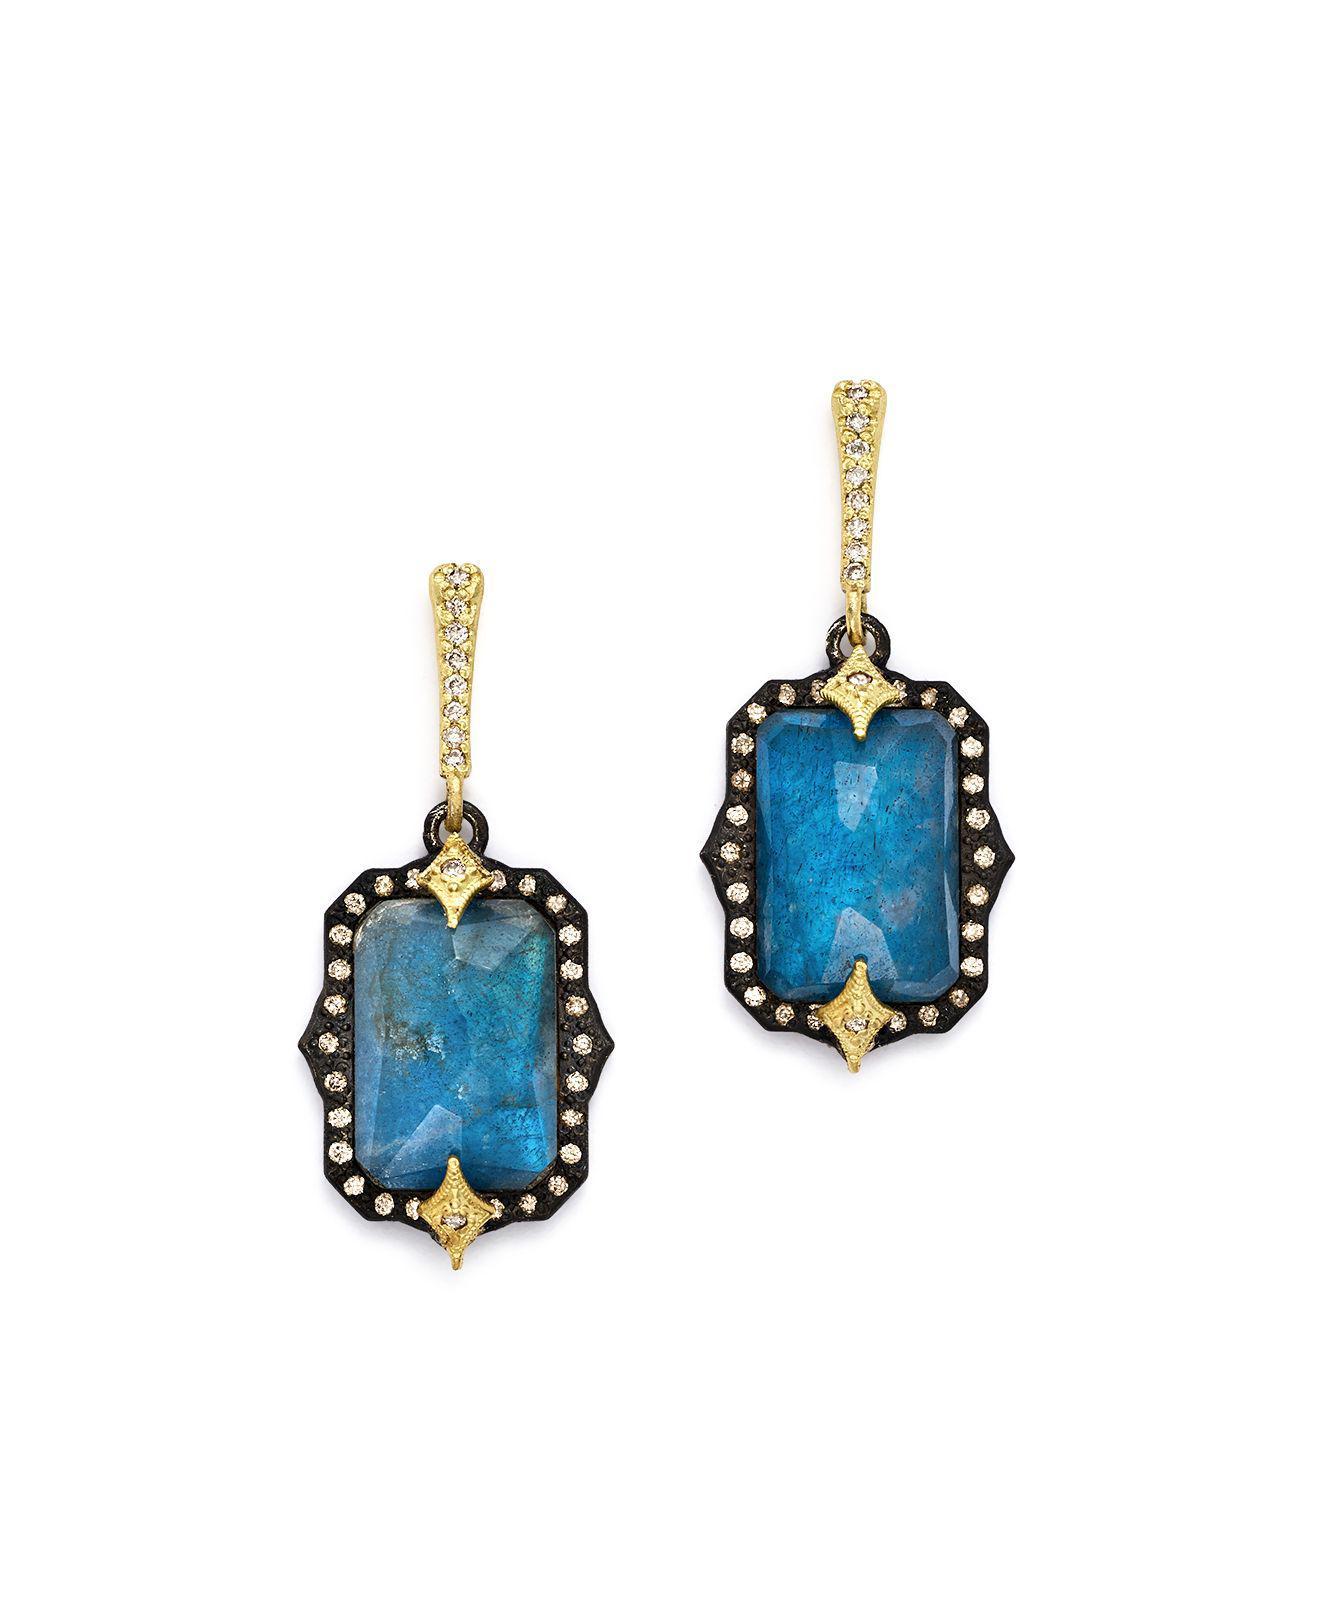 Armenta Emerald-Cut Triplet Drop Earrings w/ 18k Gold eRKQ7QwV